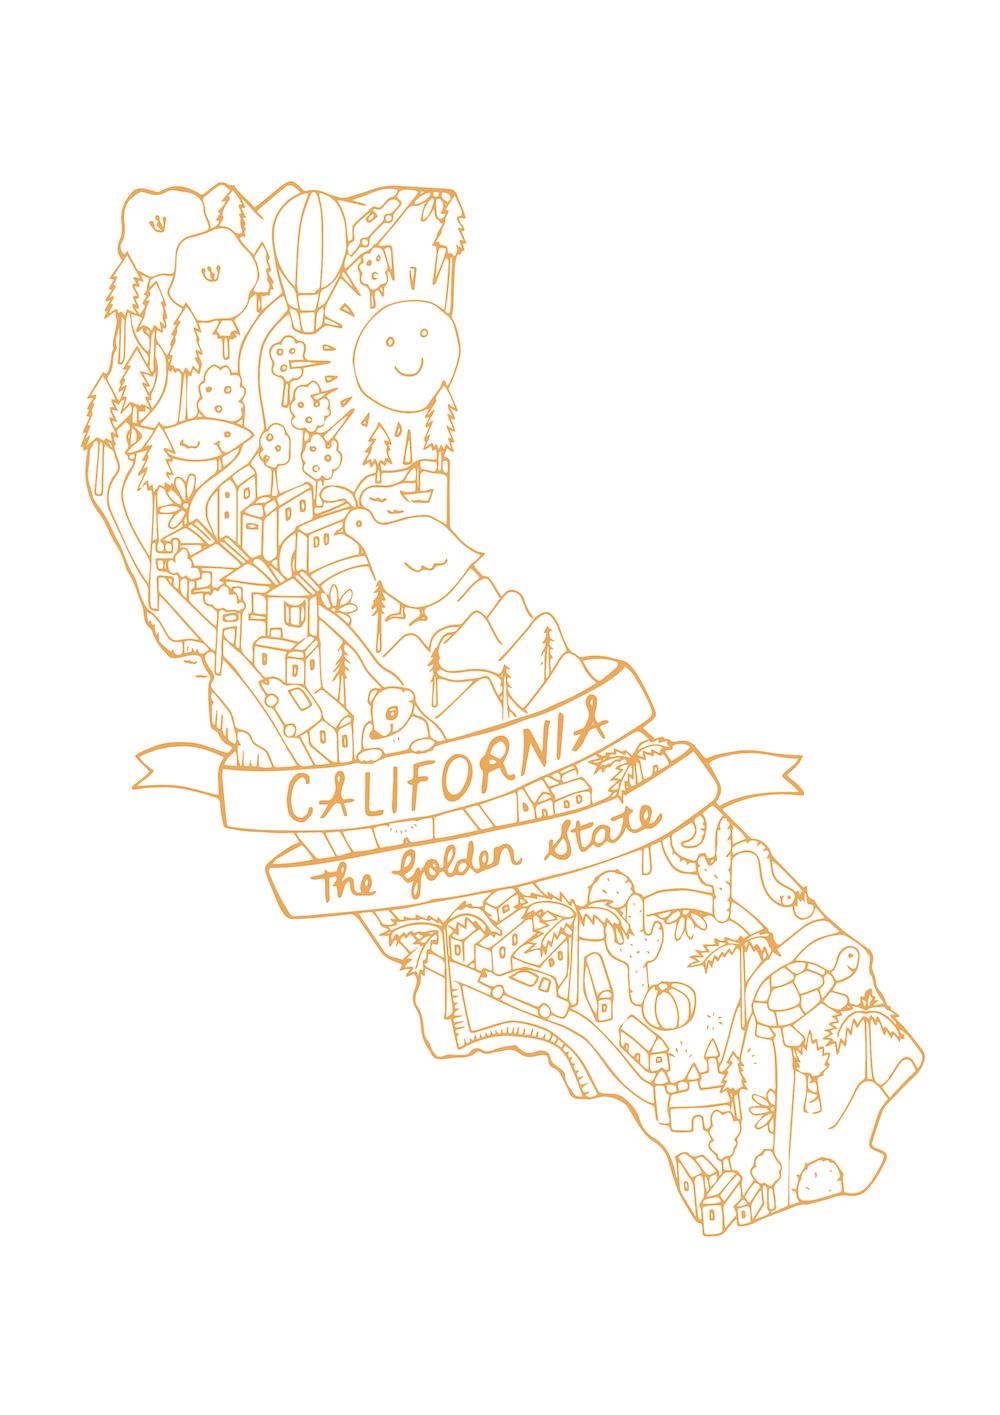 CaliforniaLove_MeganMcKean.jpg